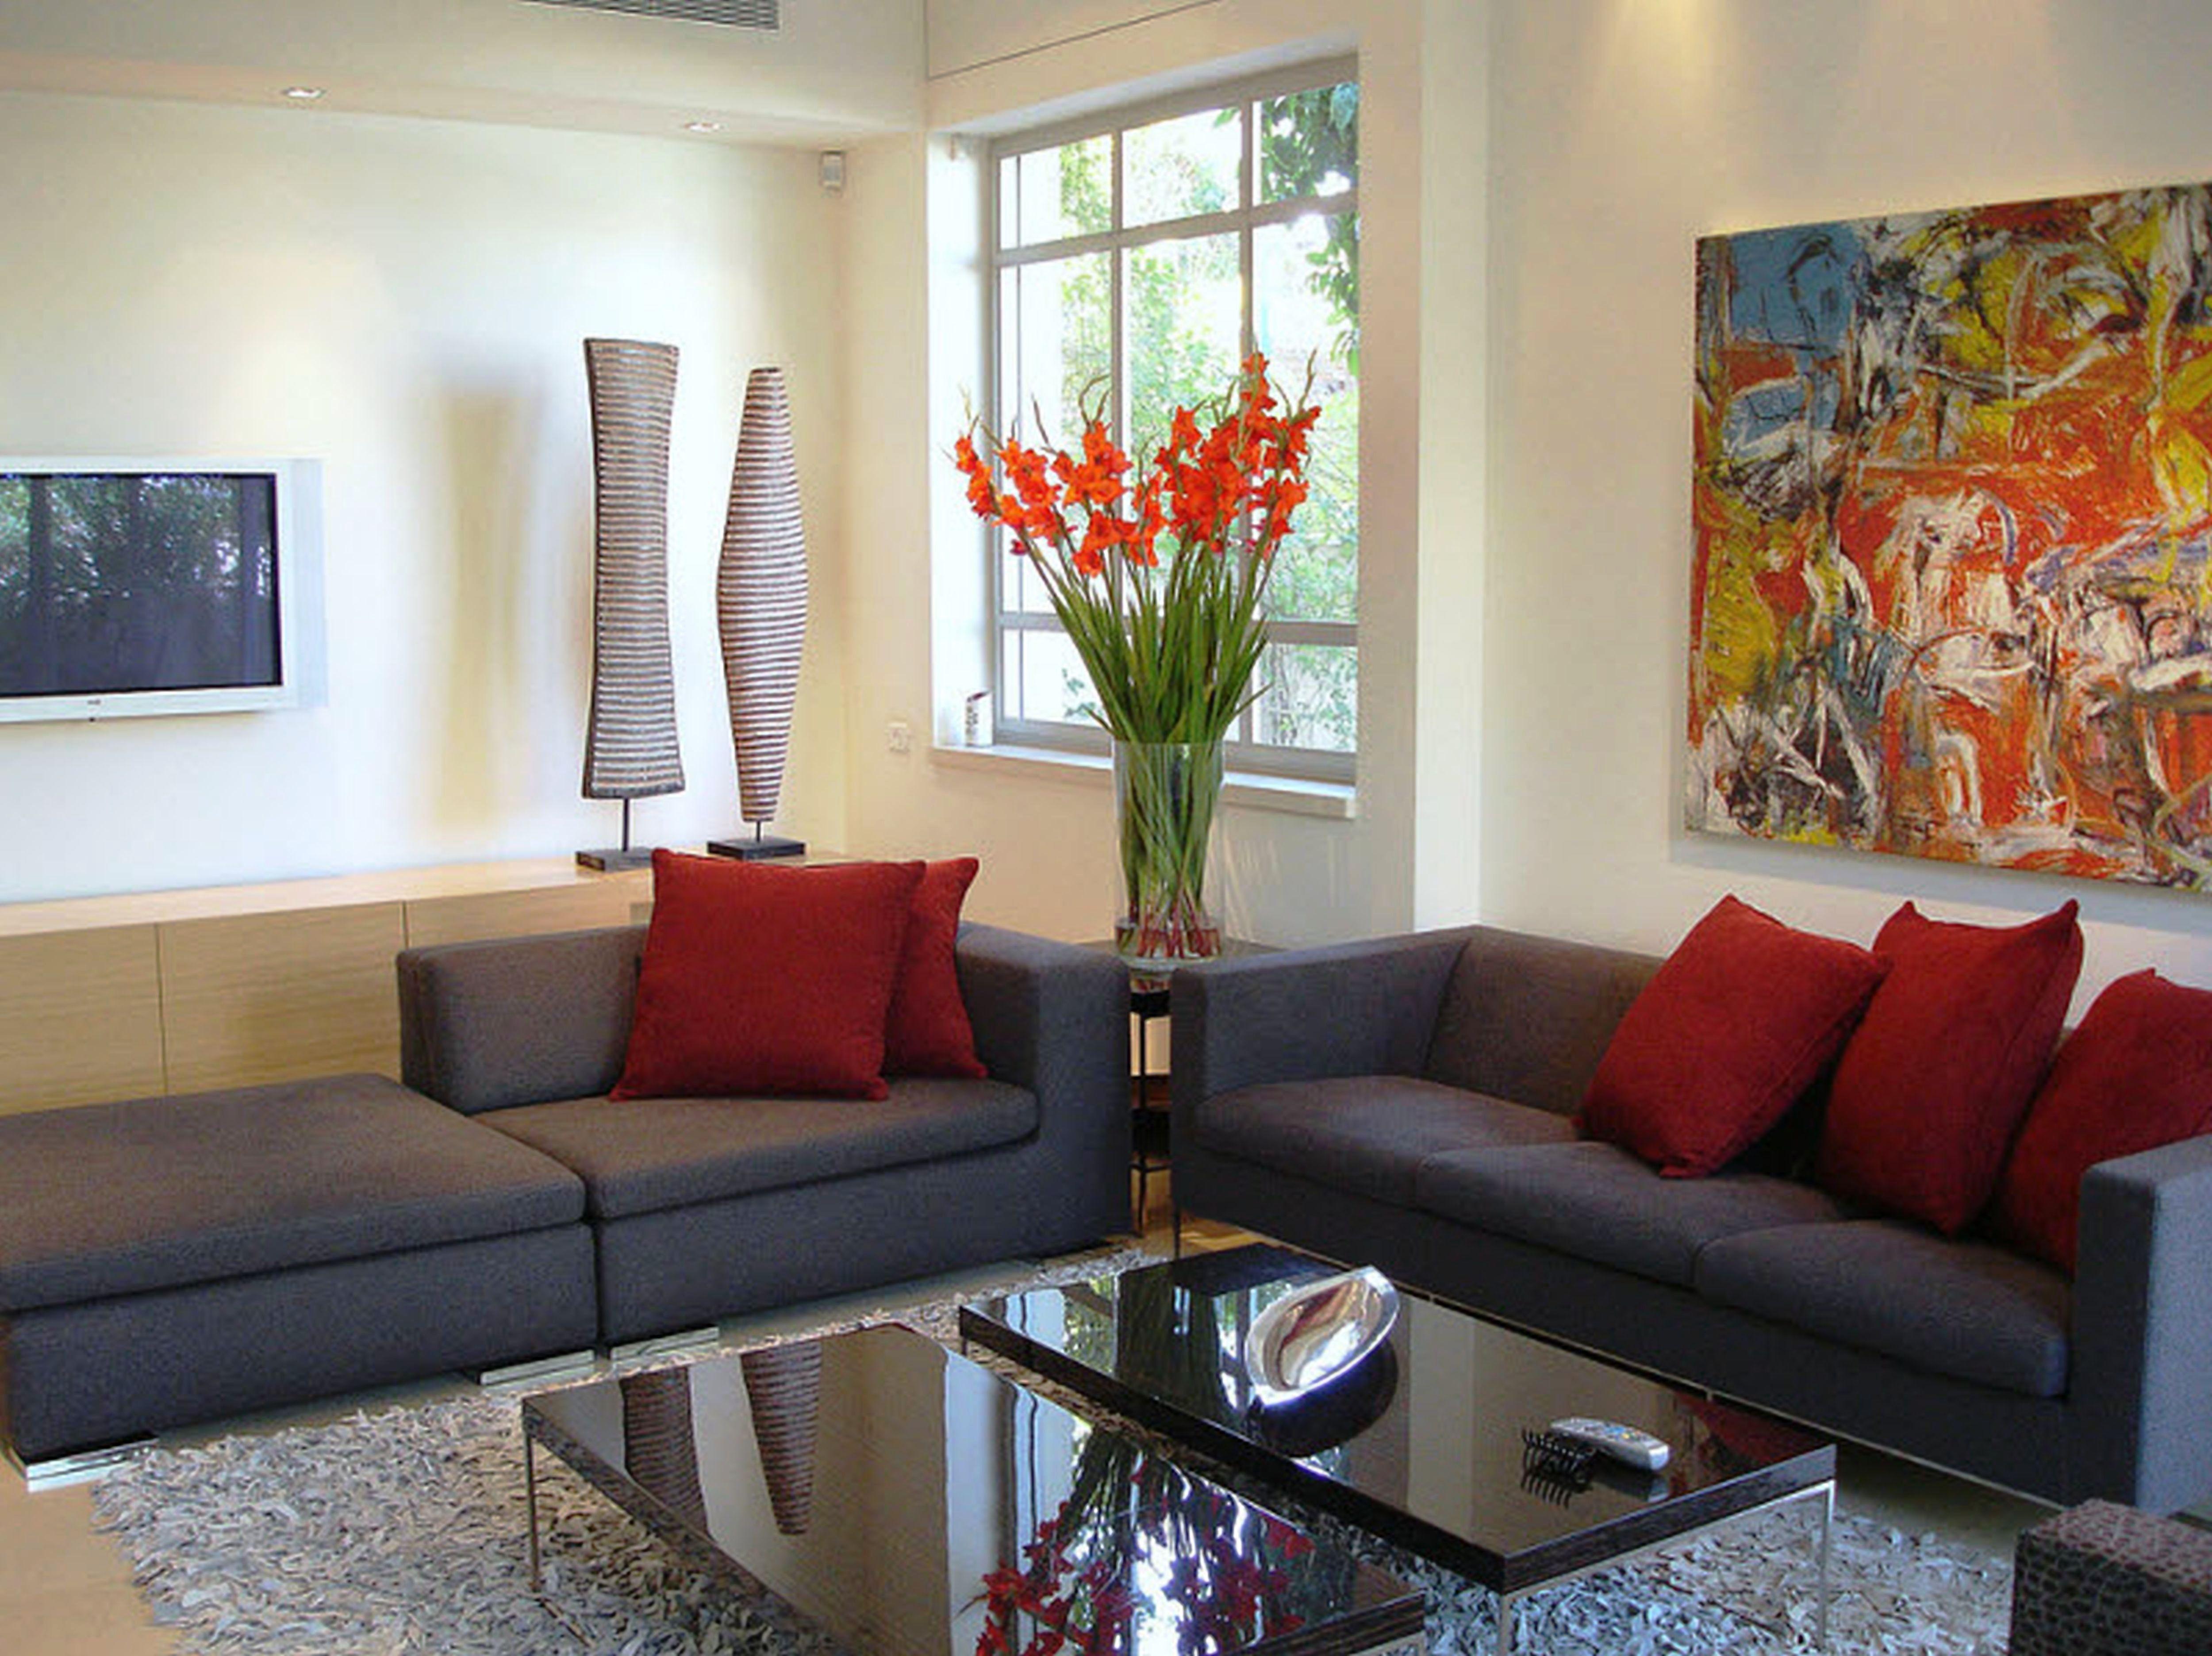 25 Budget Home Decor Ideas For 2016 - Instaloverz on Awesome Apartment Budget Apartment Living Room Ideas  id=44722